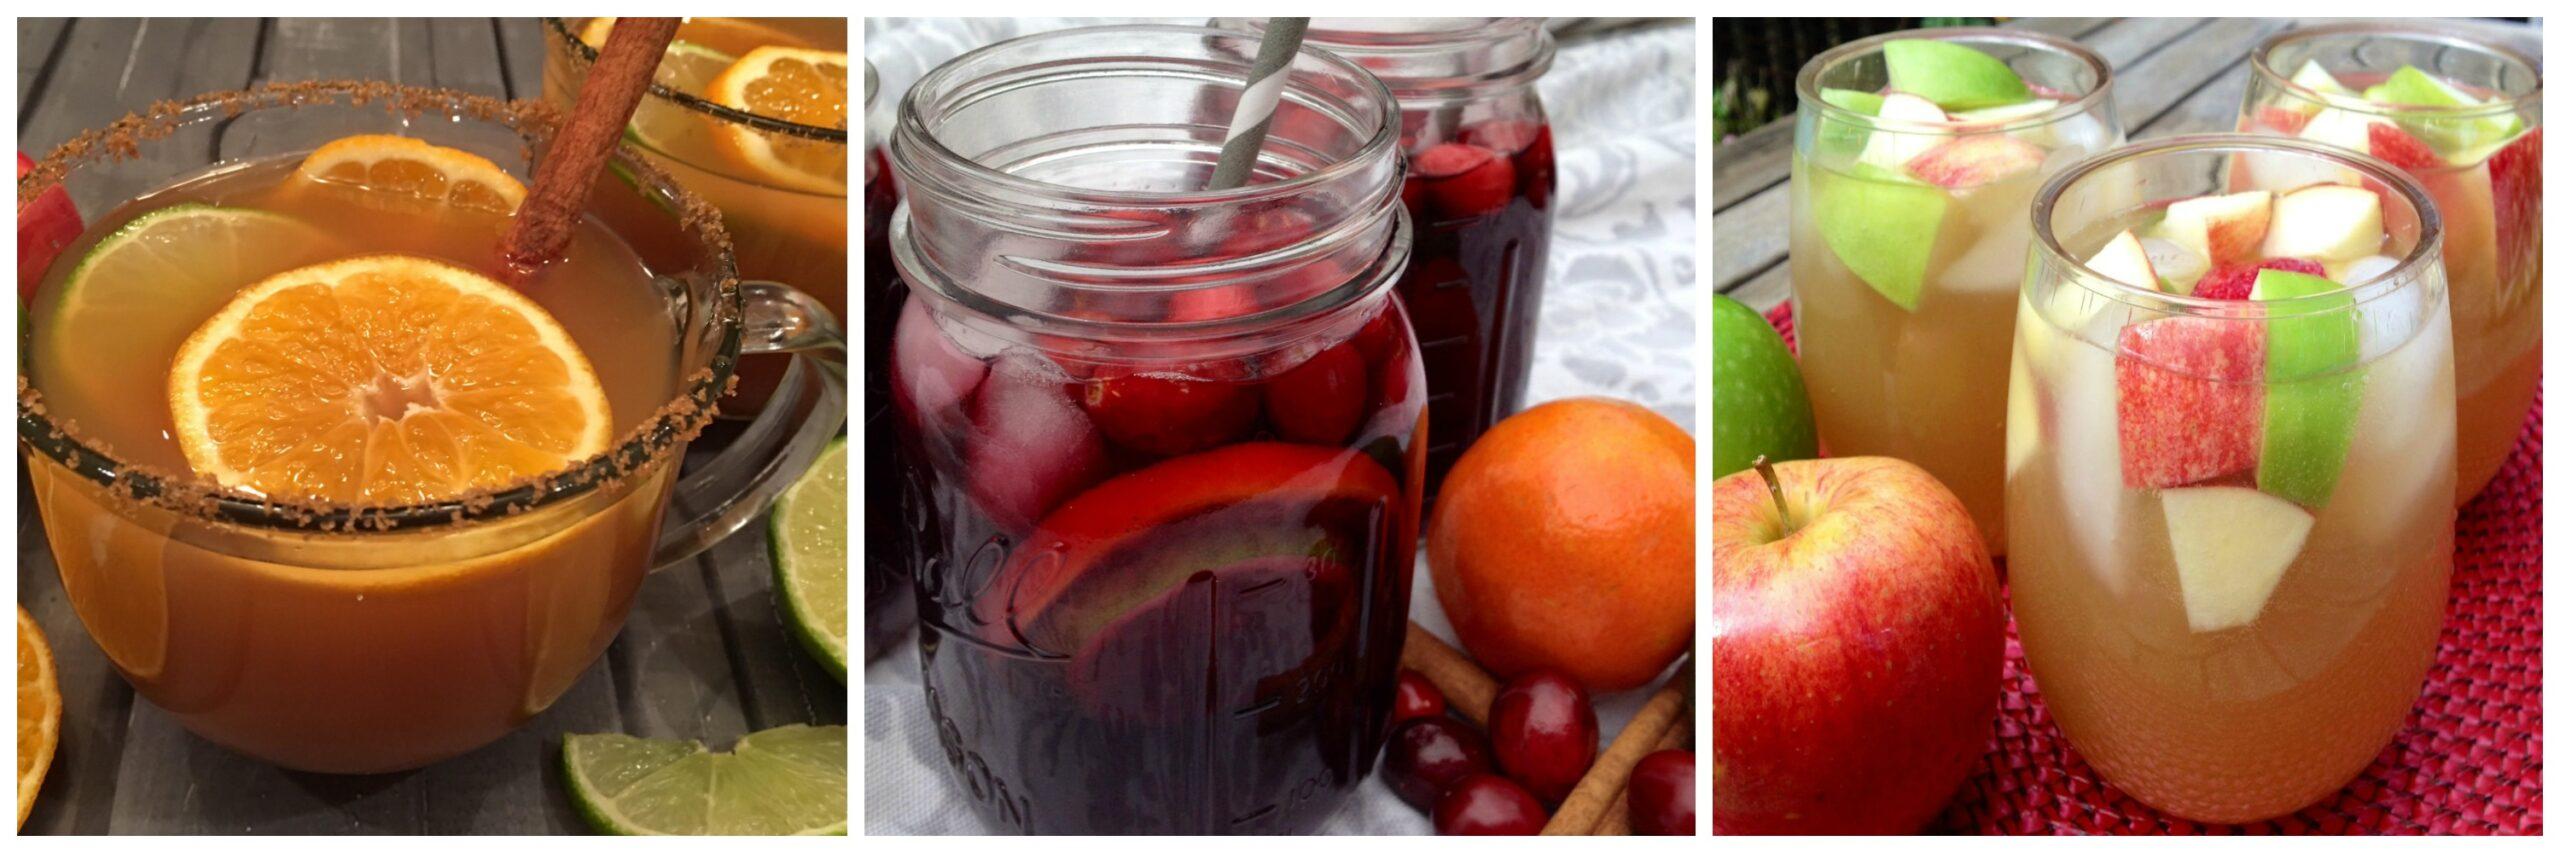 Left to Right: Mulled Apple Cider; Cranberry Sangria; Apple Cider Sangria